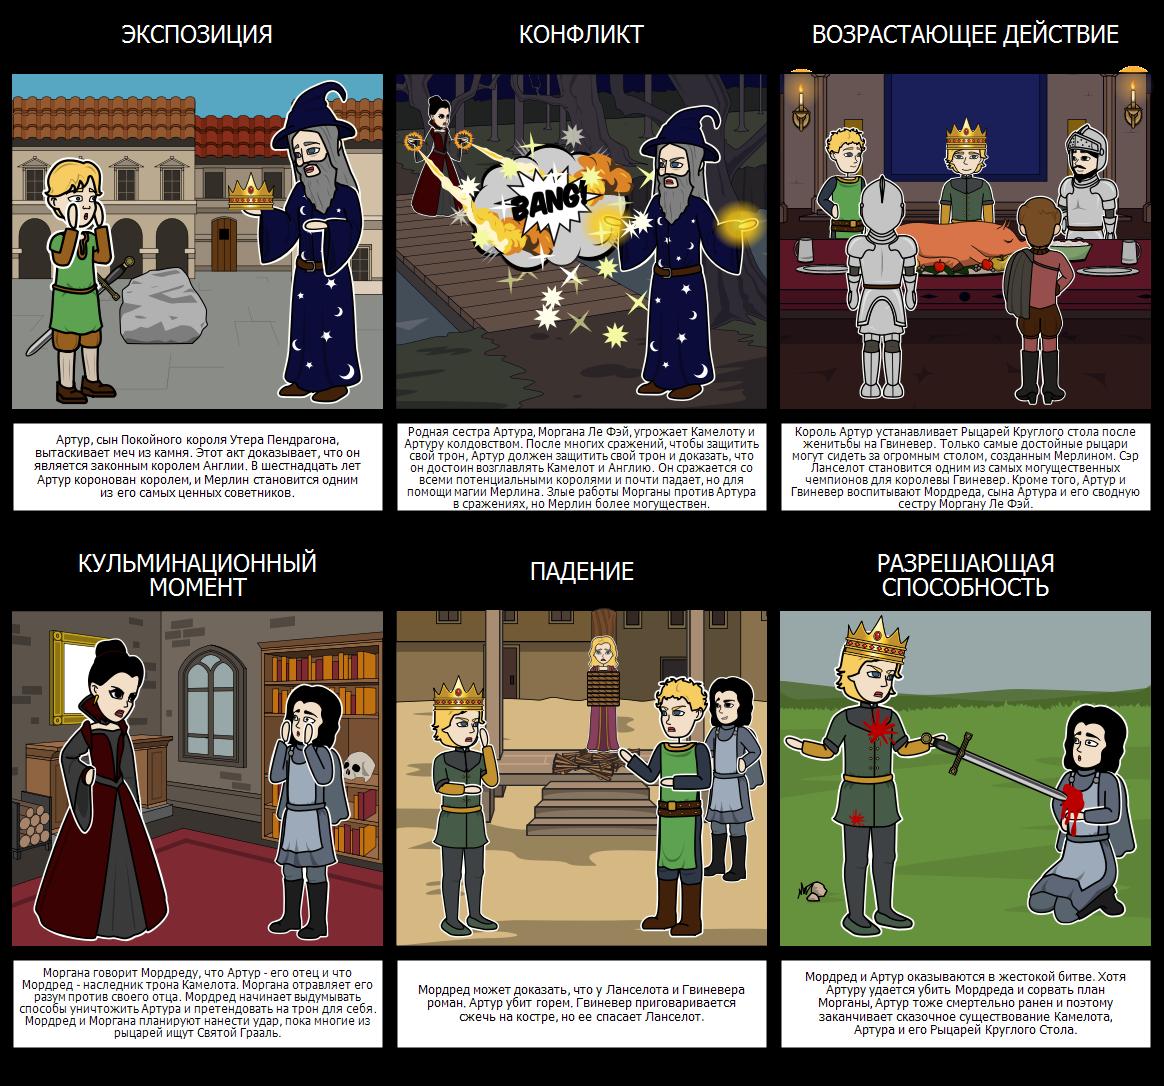 Король Артур и Рыцари Круглого Стола - Участок Диаграмма